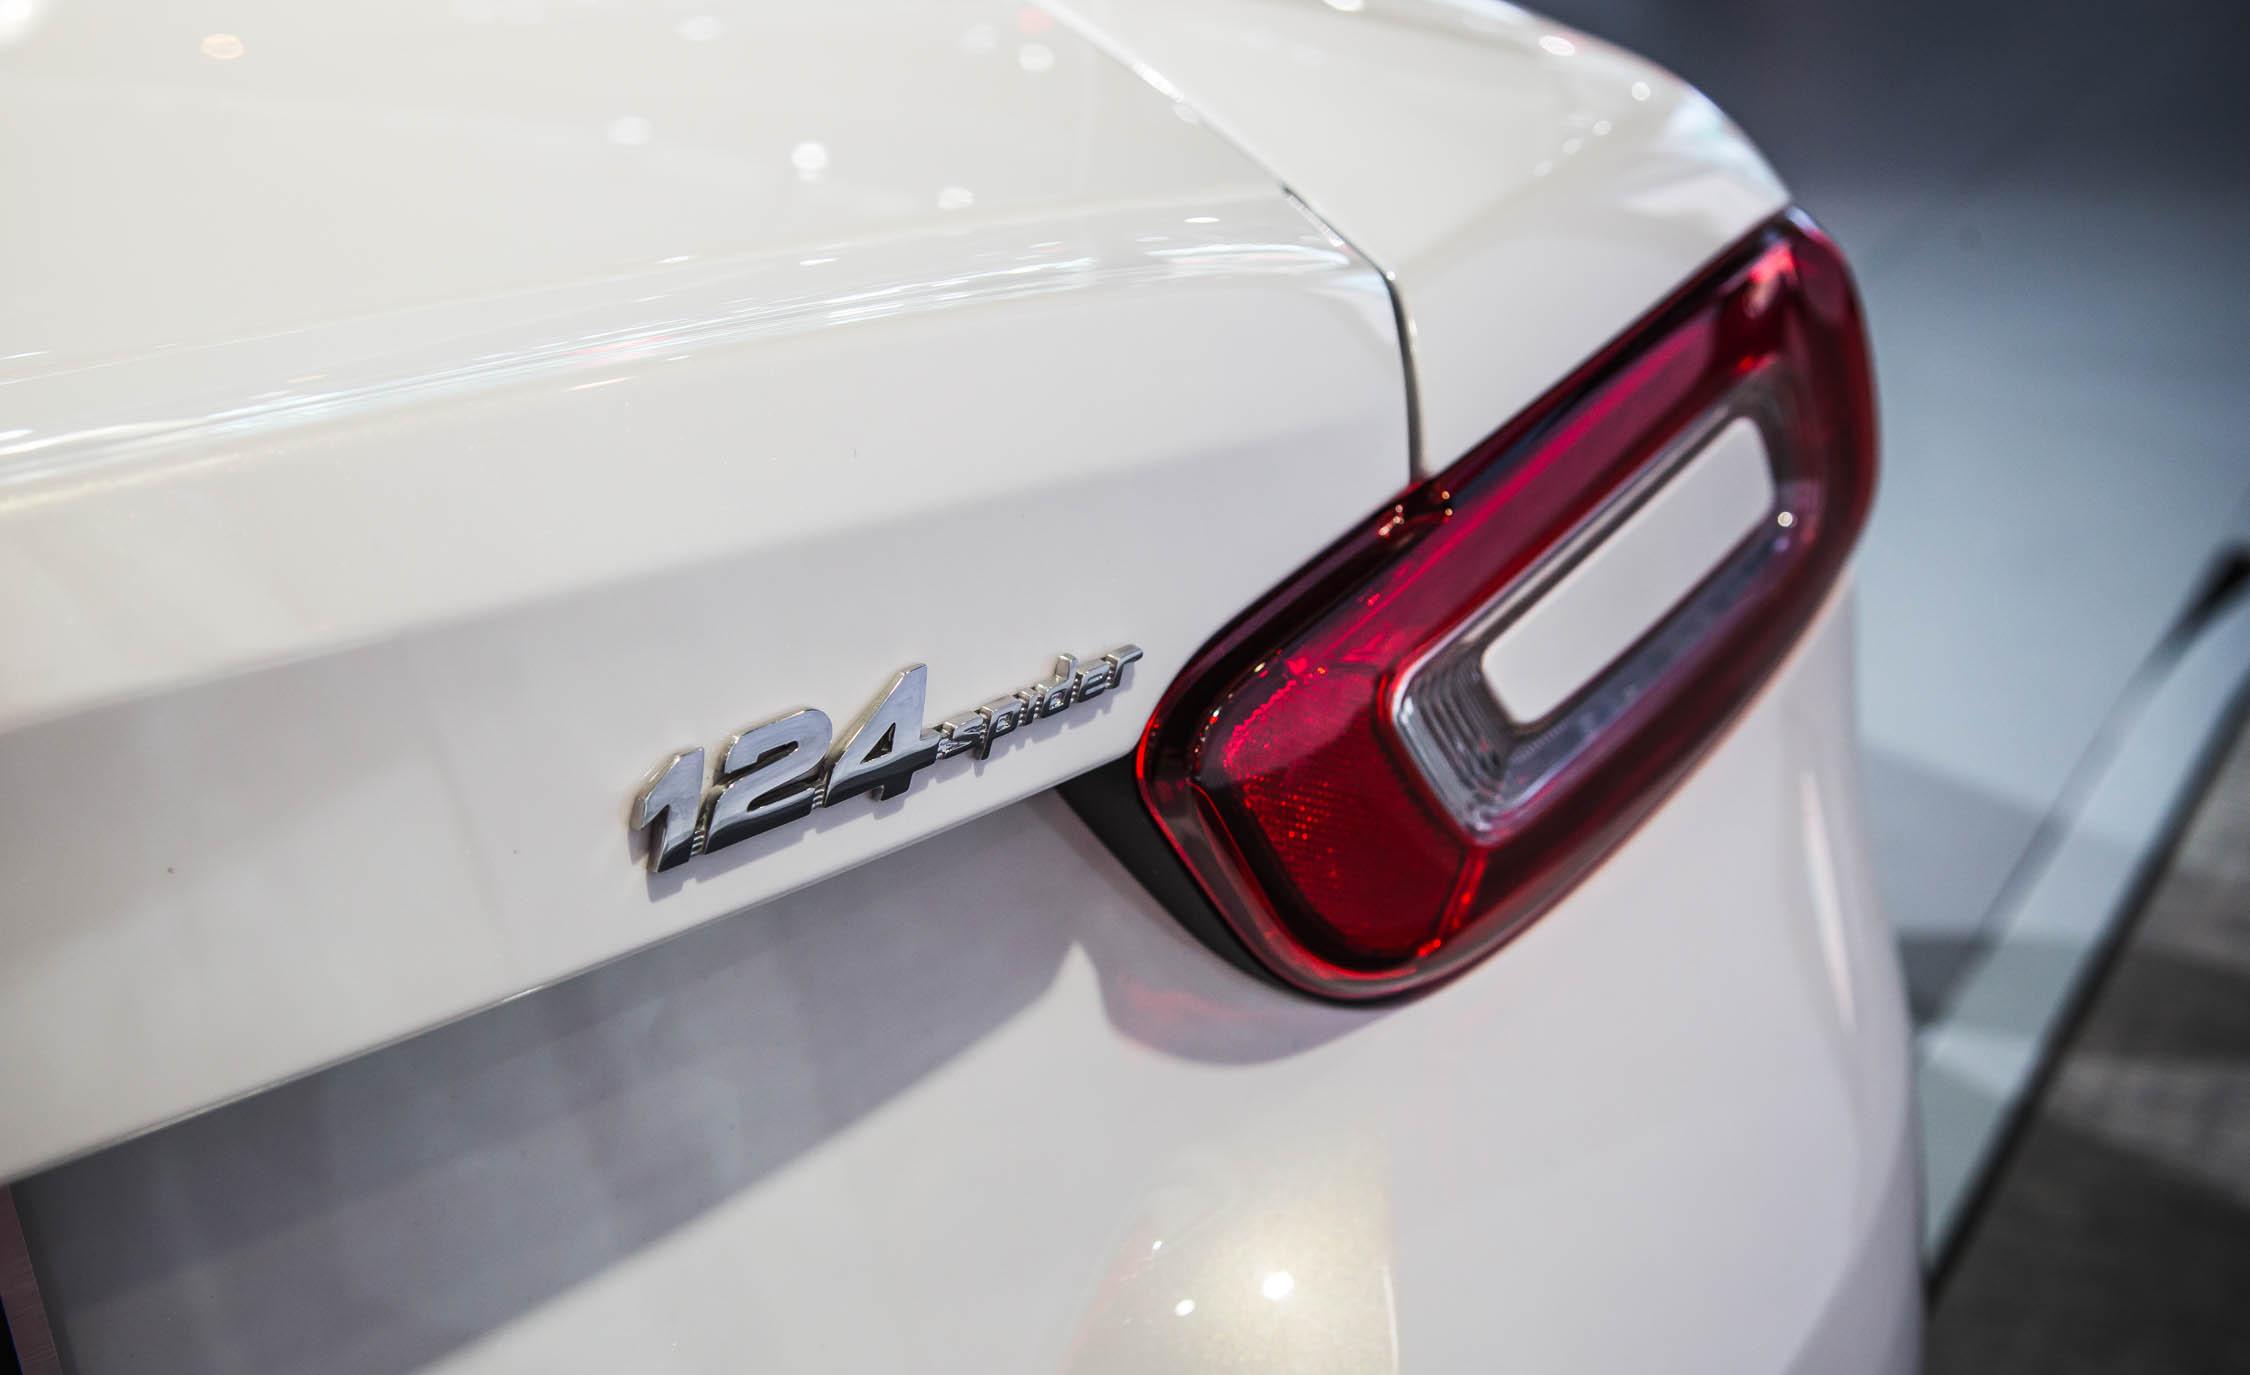 2017 Fiat 124 Spider Rear Emblem (View 10 of 23)